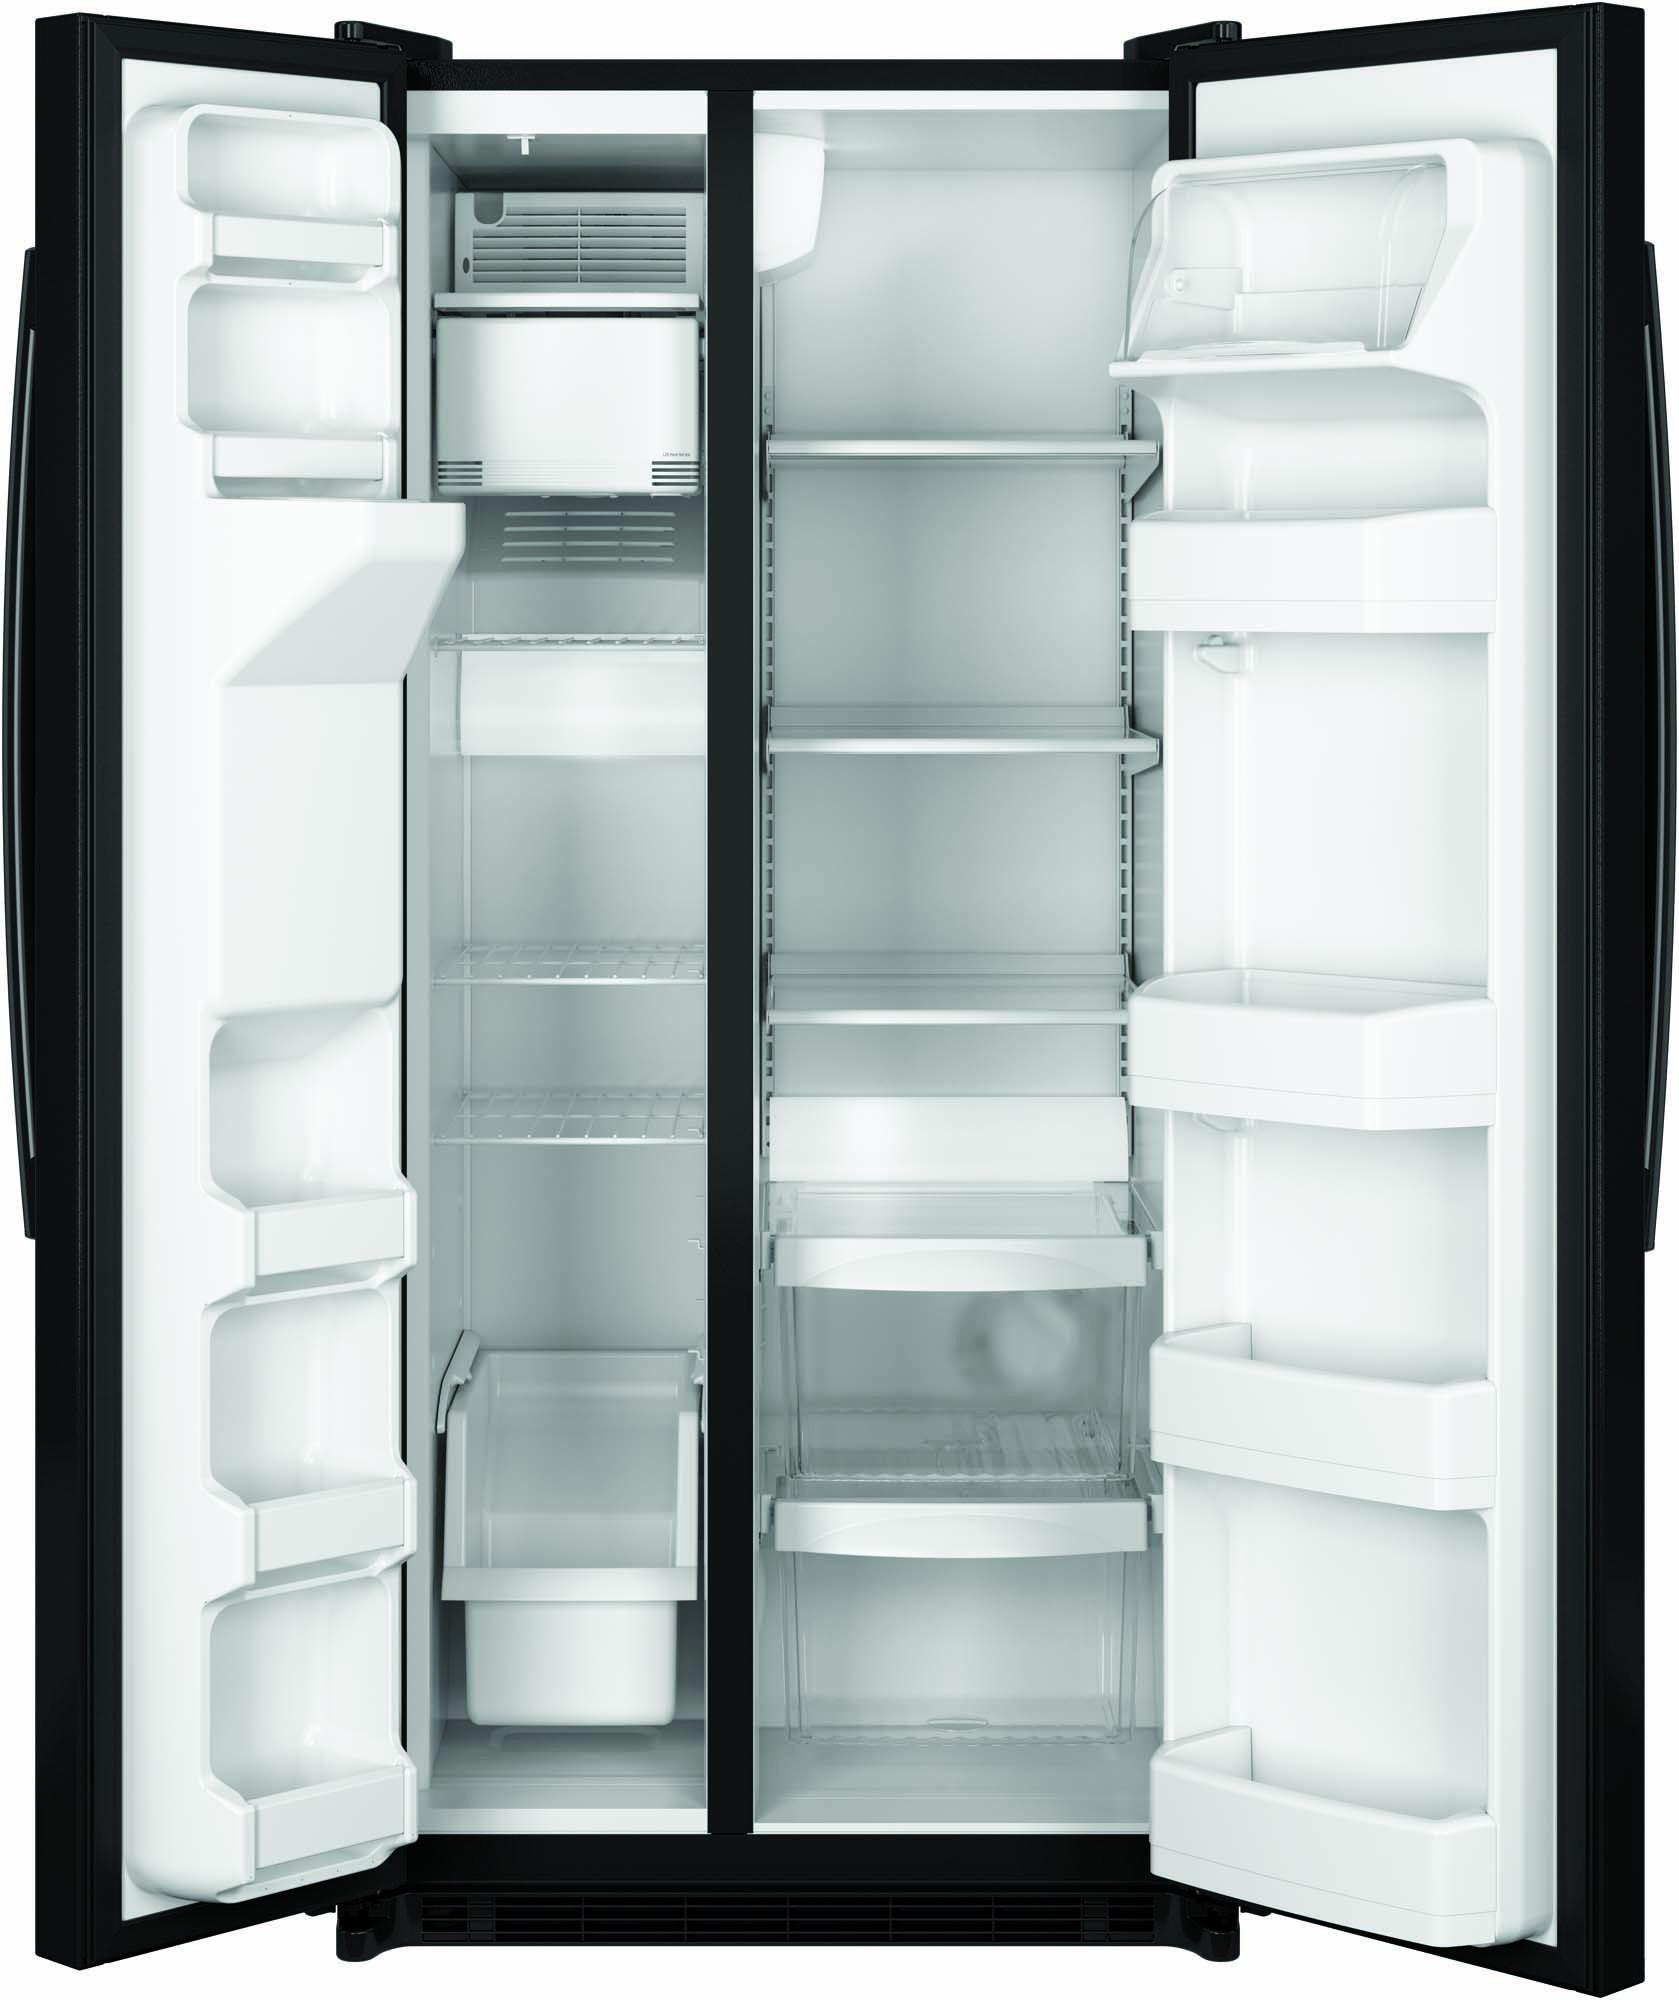 GE Appliances GSS20ETHBB 19.9 cu. ft. Side-by-Side Refrigerator - Black